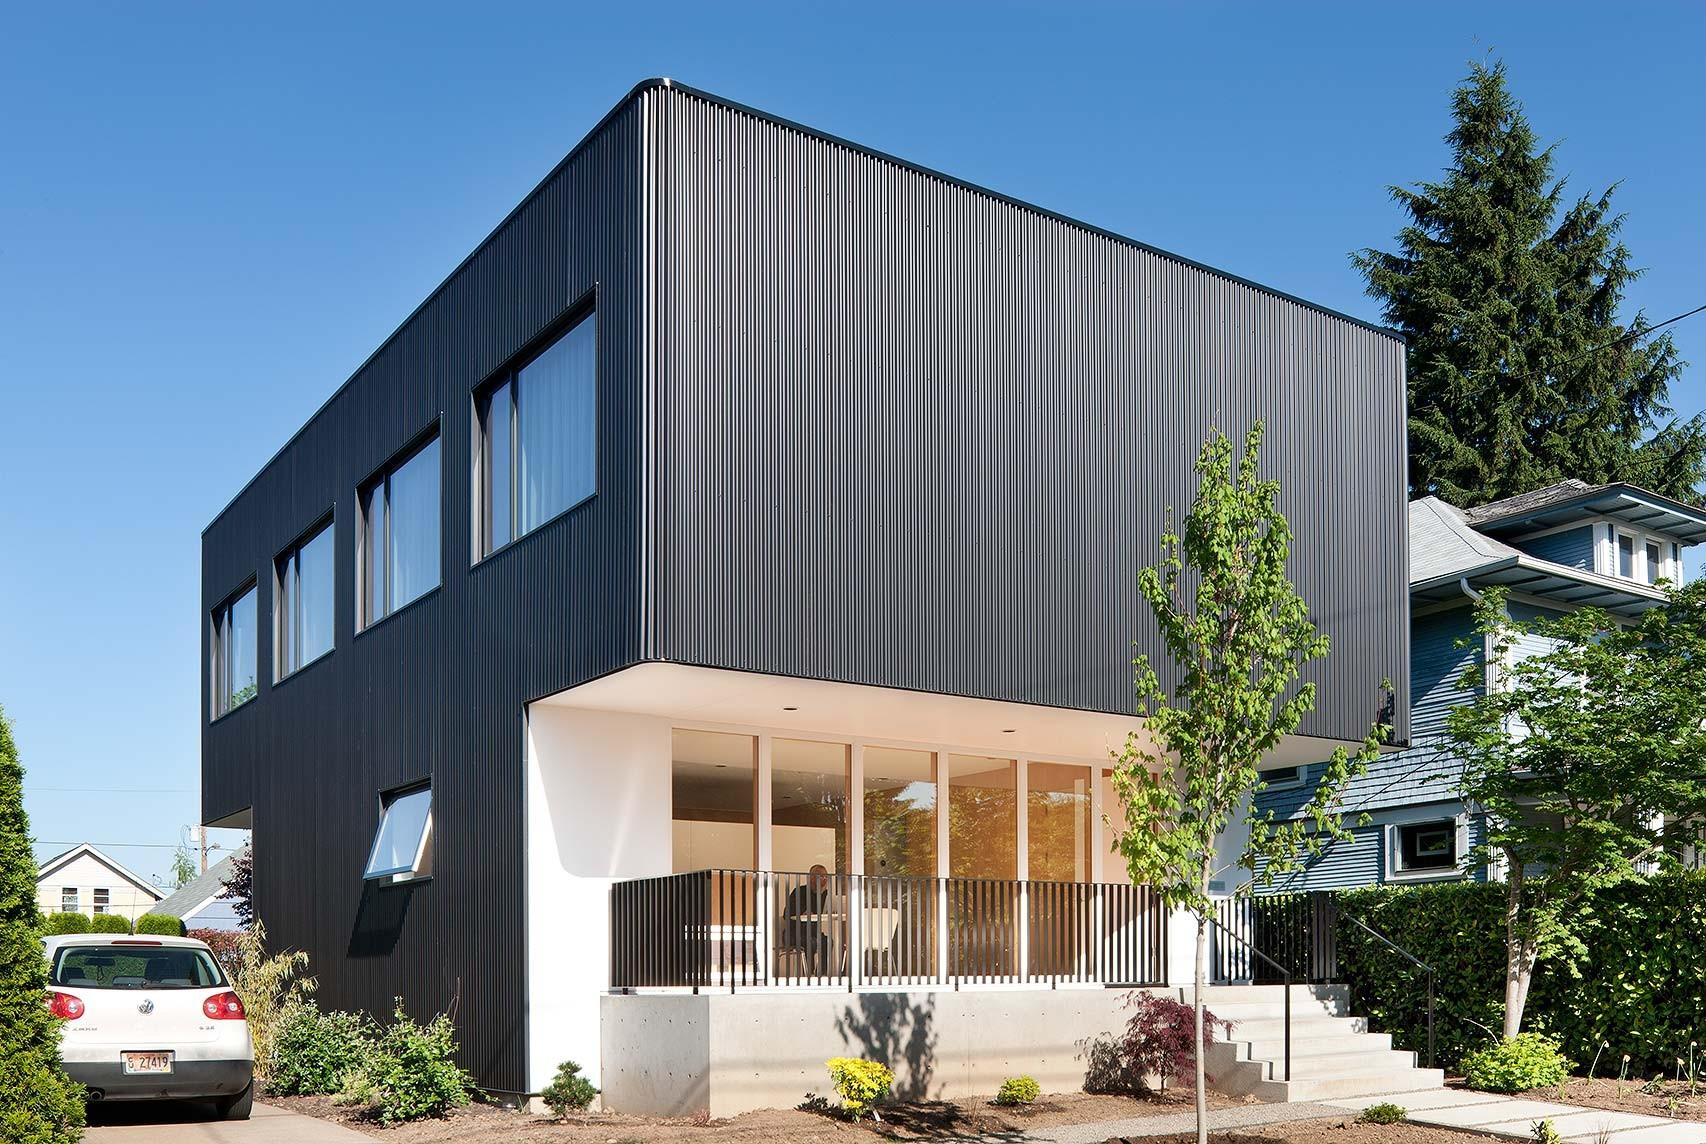 Oakley House / Benjamin Waechter Architect, © Lara Swimmer